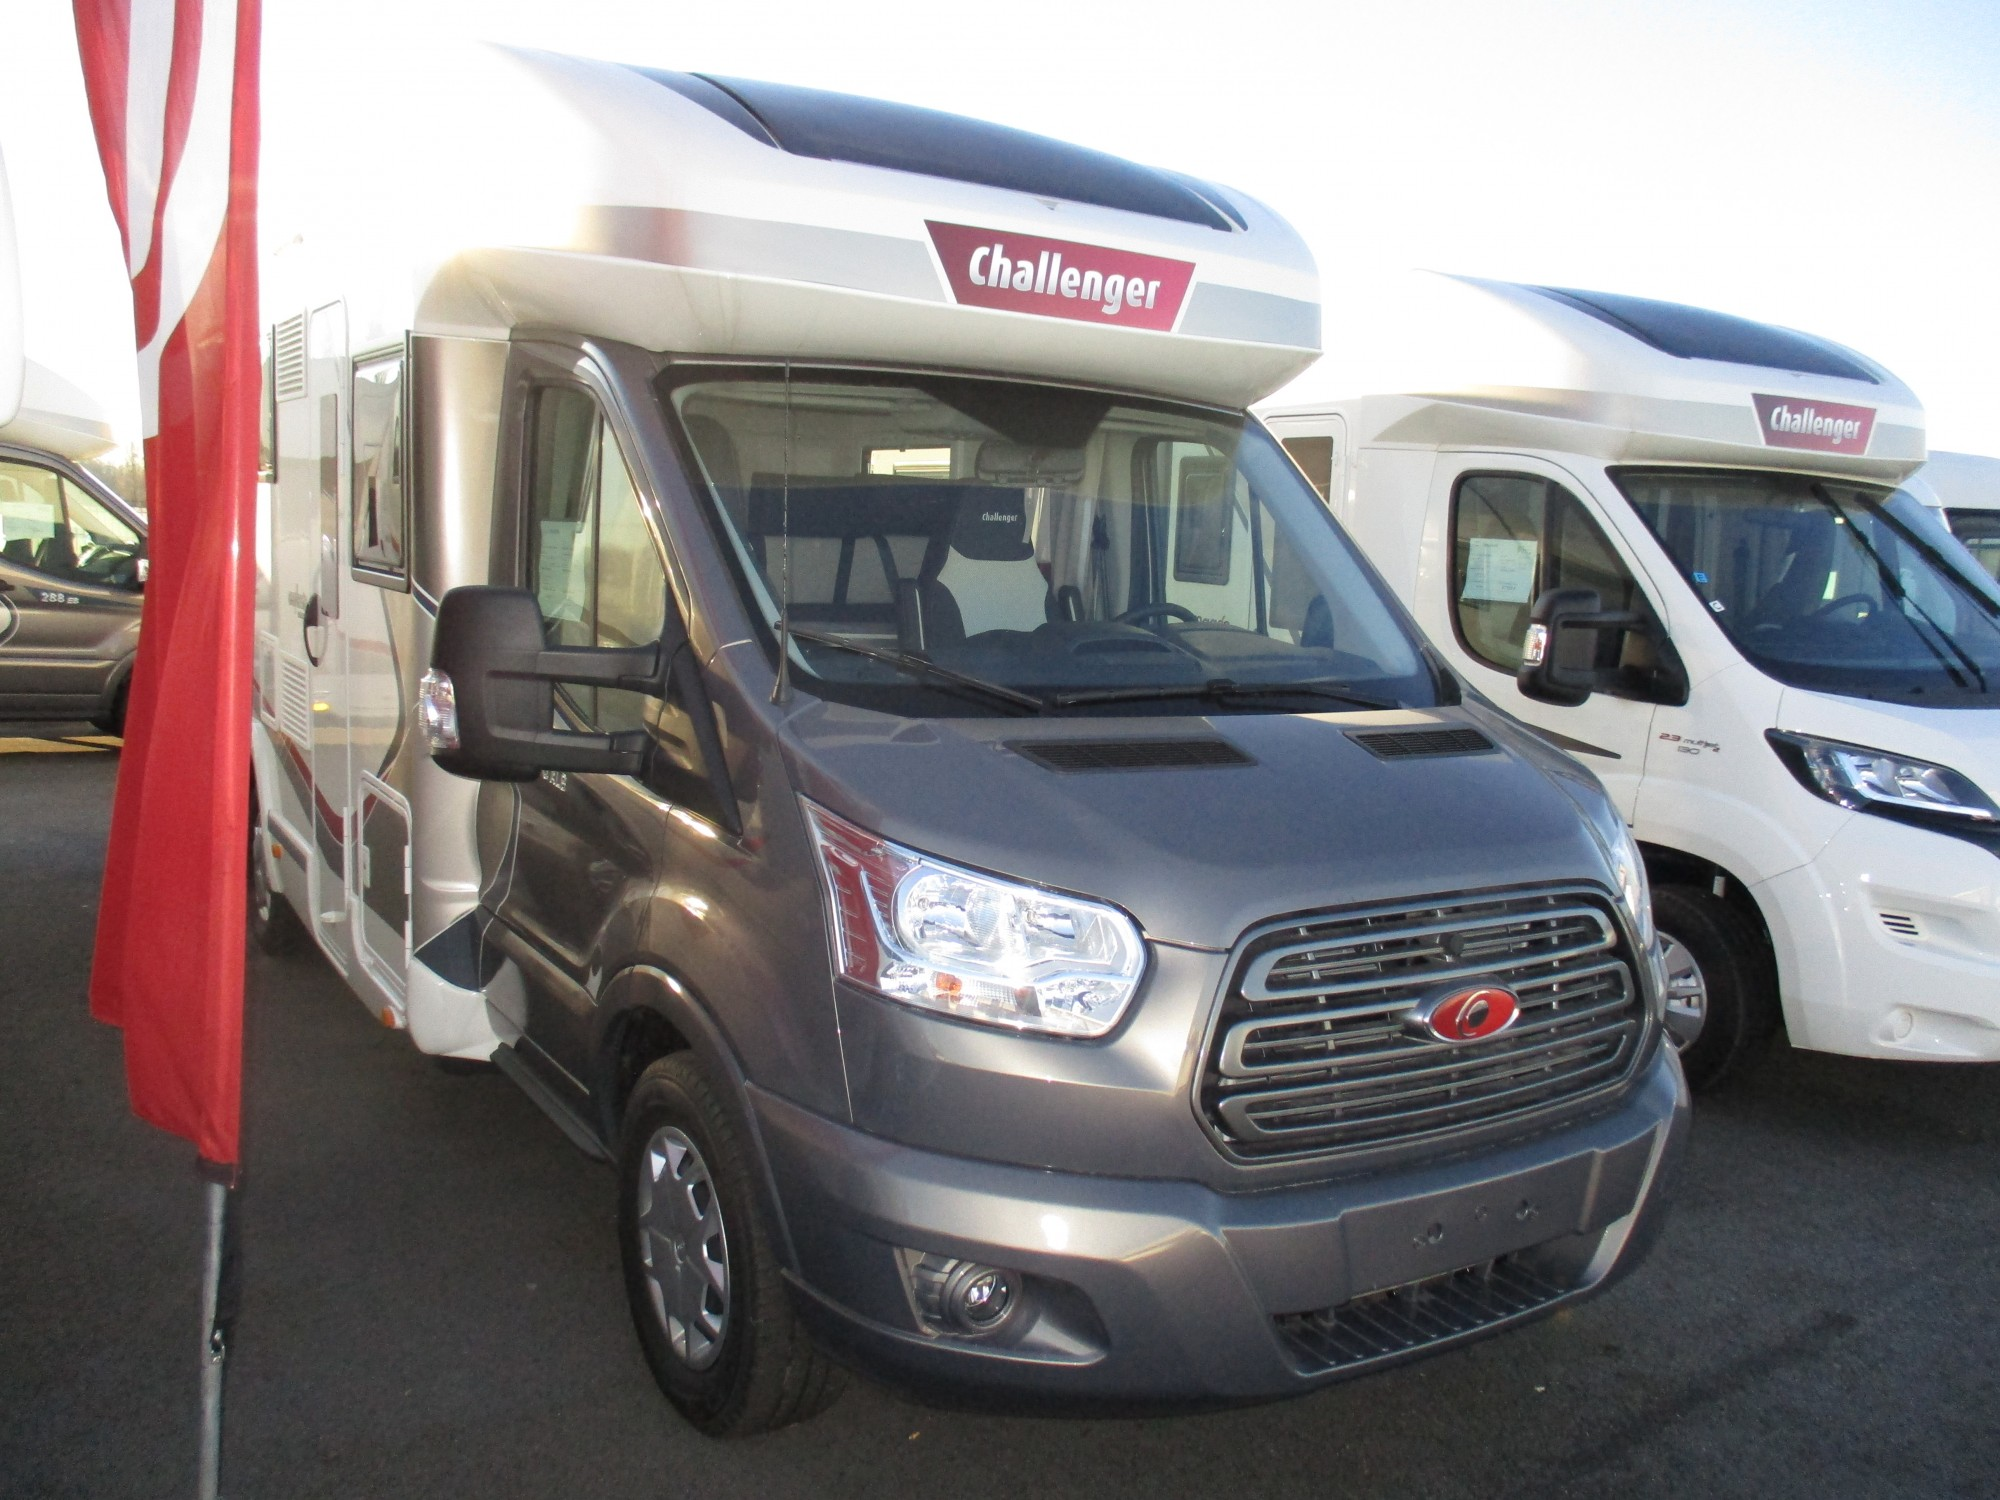 Magasin Salle De Bain Yvetot ~ vente de caravane haut de gamme yvetot 76190 rouen caravane